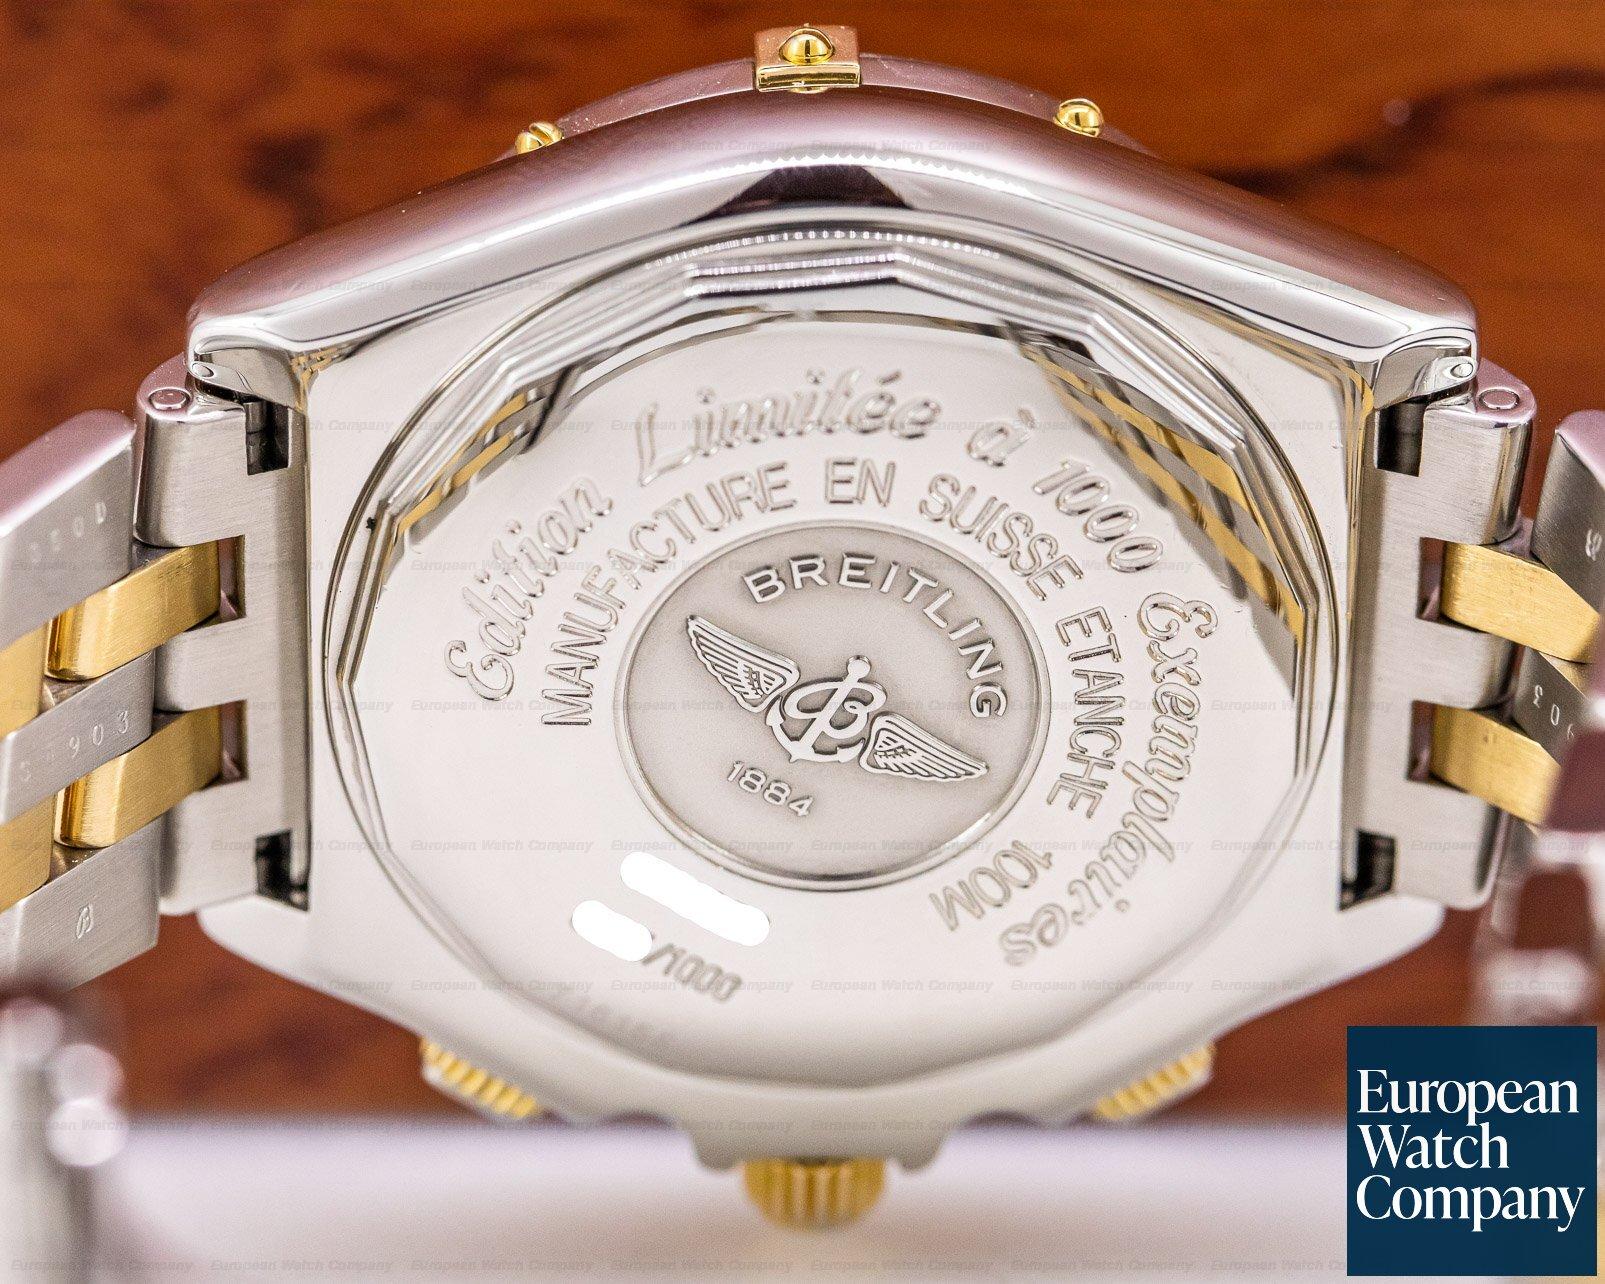 Breitling B44356 Crosswind Special Chronograph SS / YG